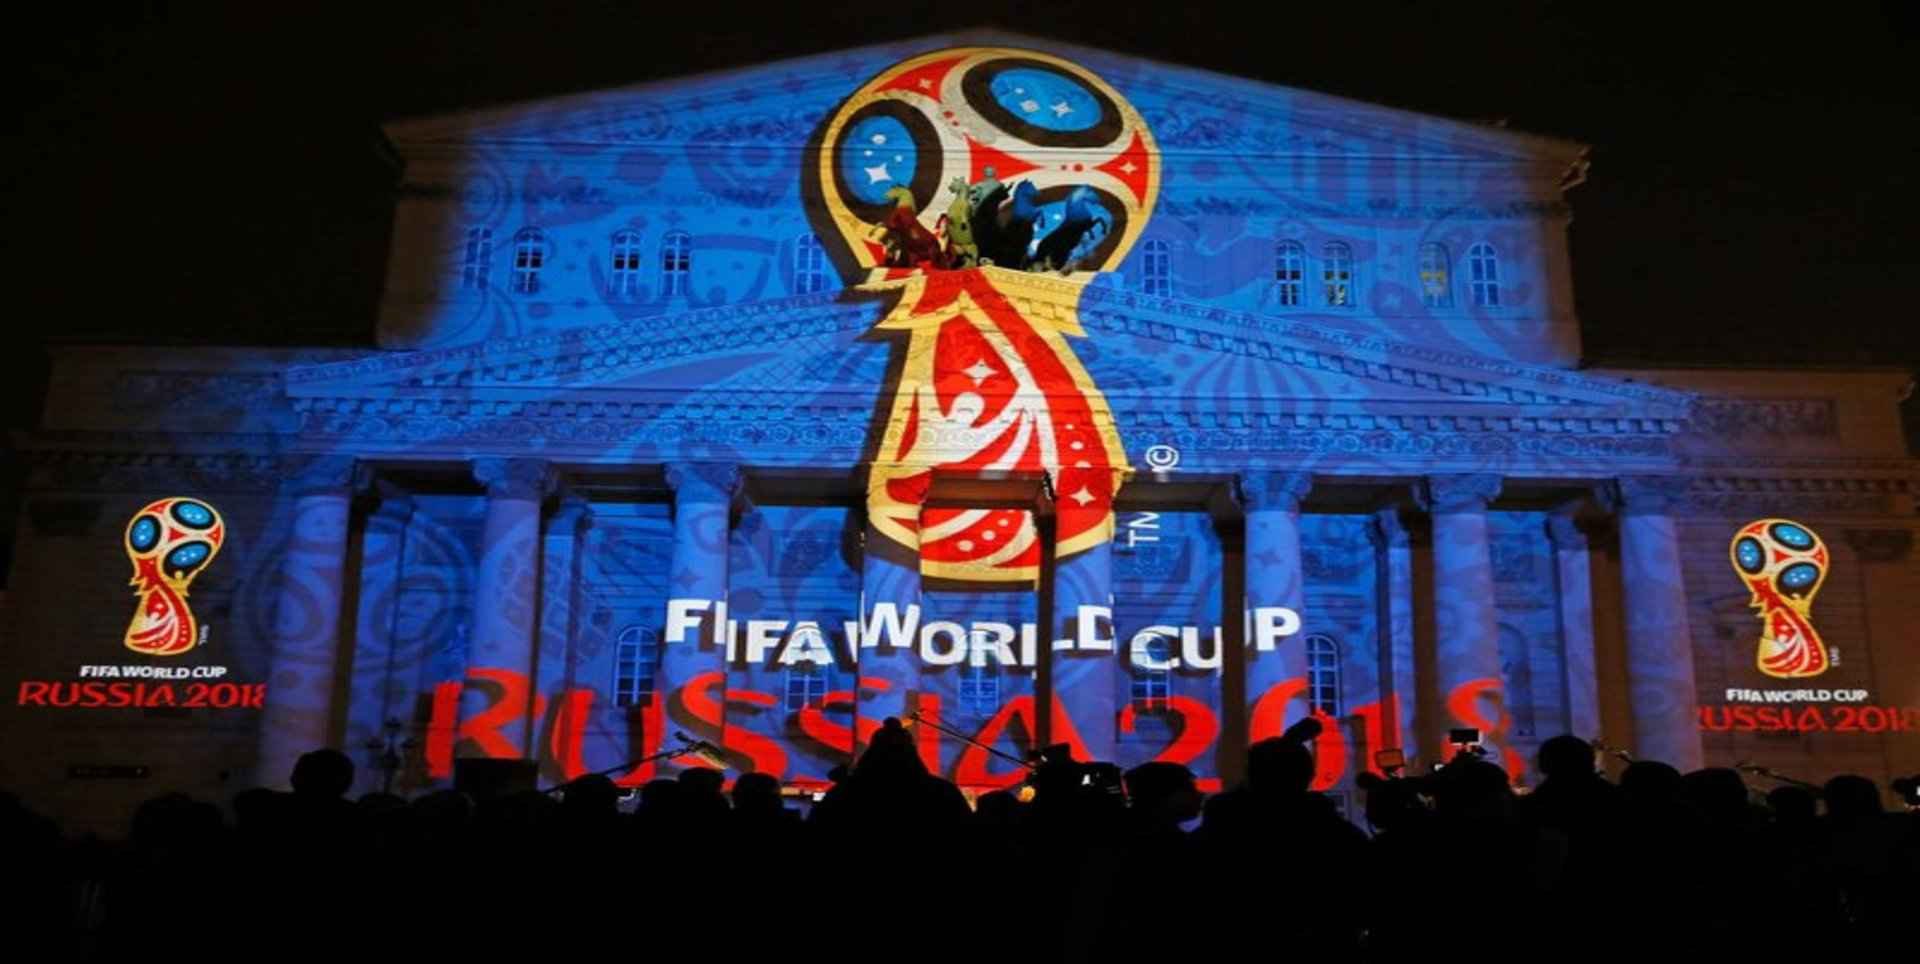 FIFA WC Israel VS Spain Live